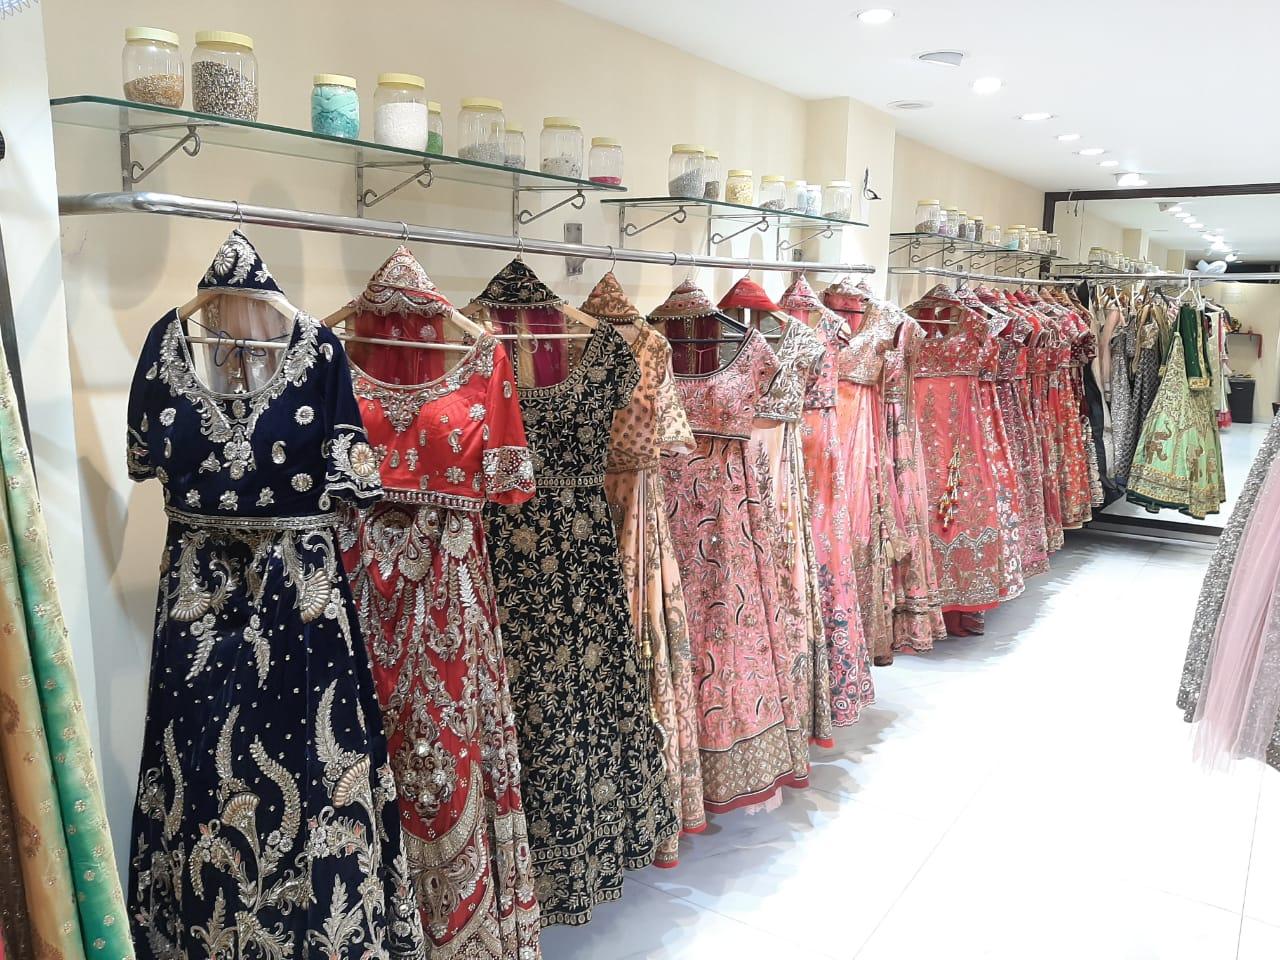 Profitable Designer Showroom in ShahpurJat for Sale with 200 Ethnic Garments